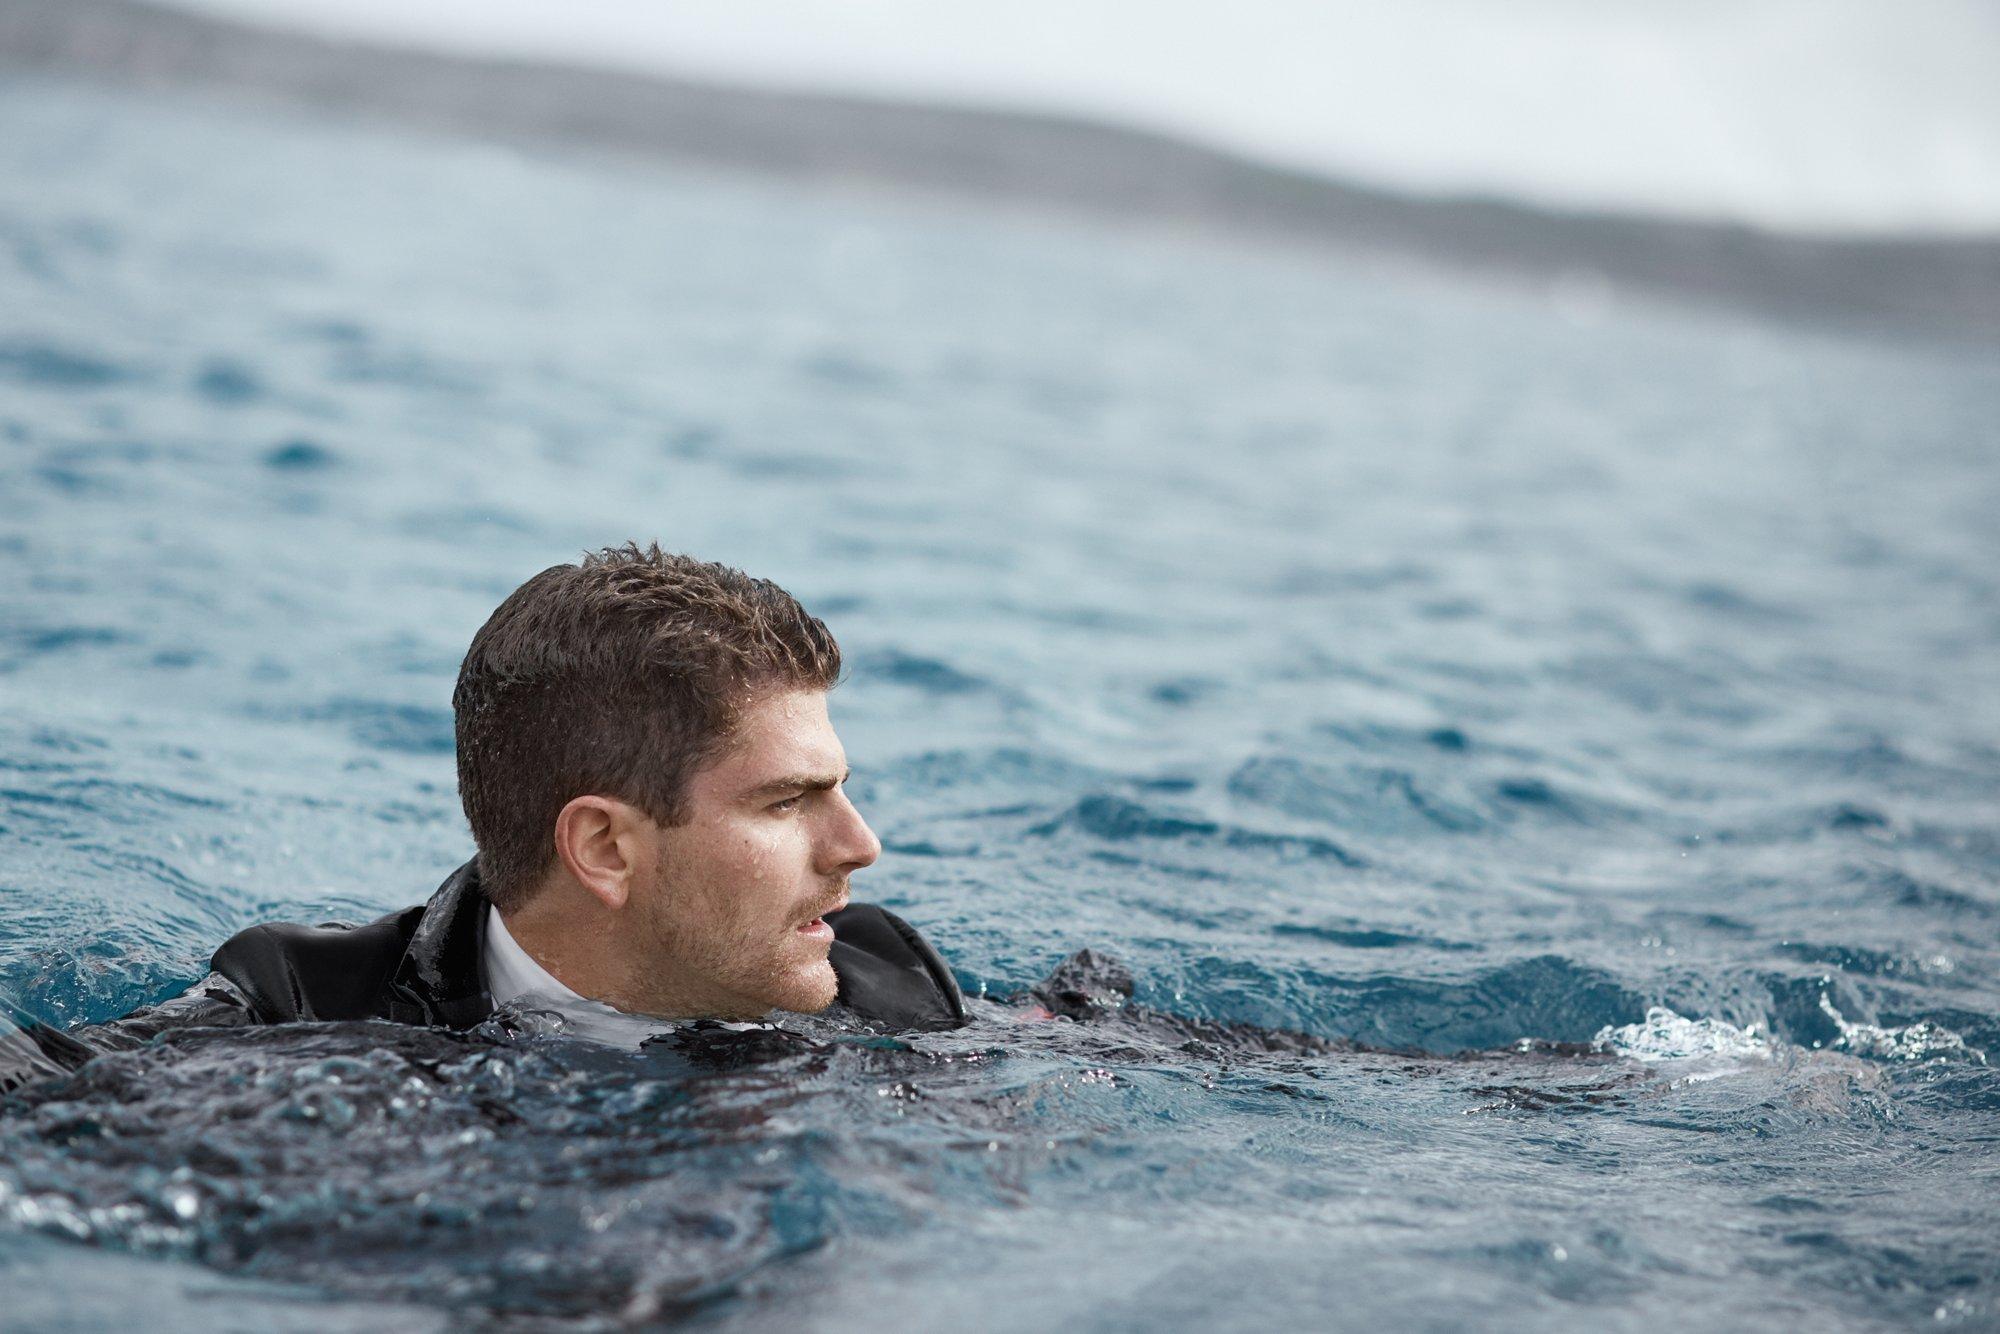 David Colturi nuota indossando l'abito Superblack by HUGO